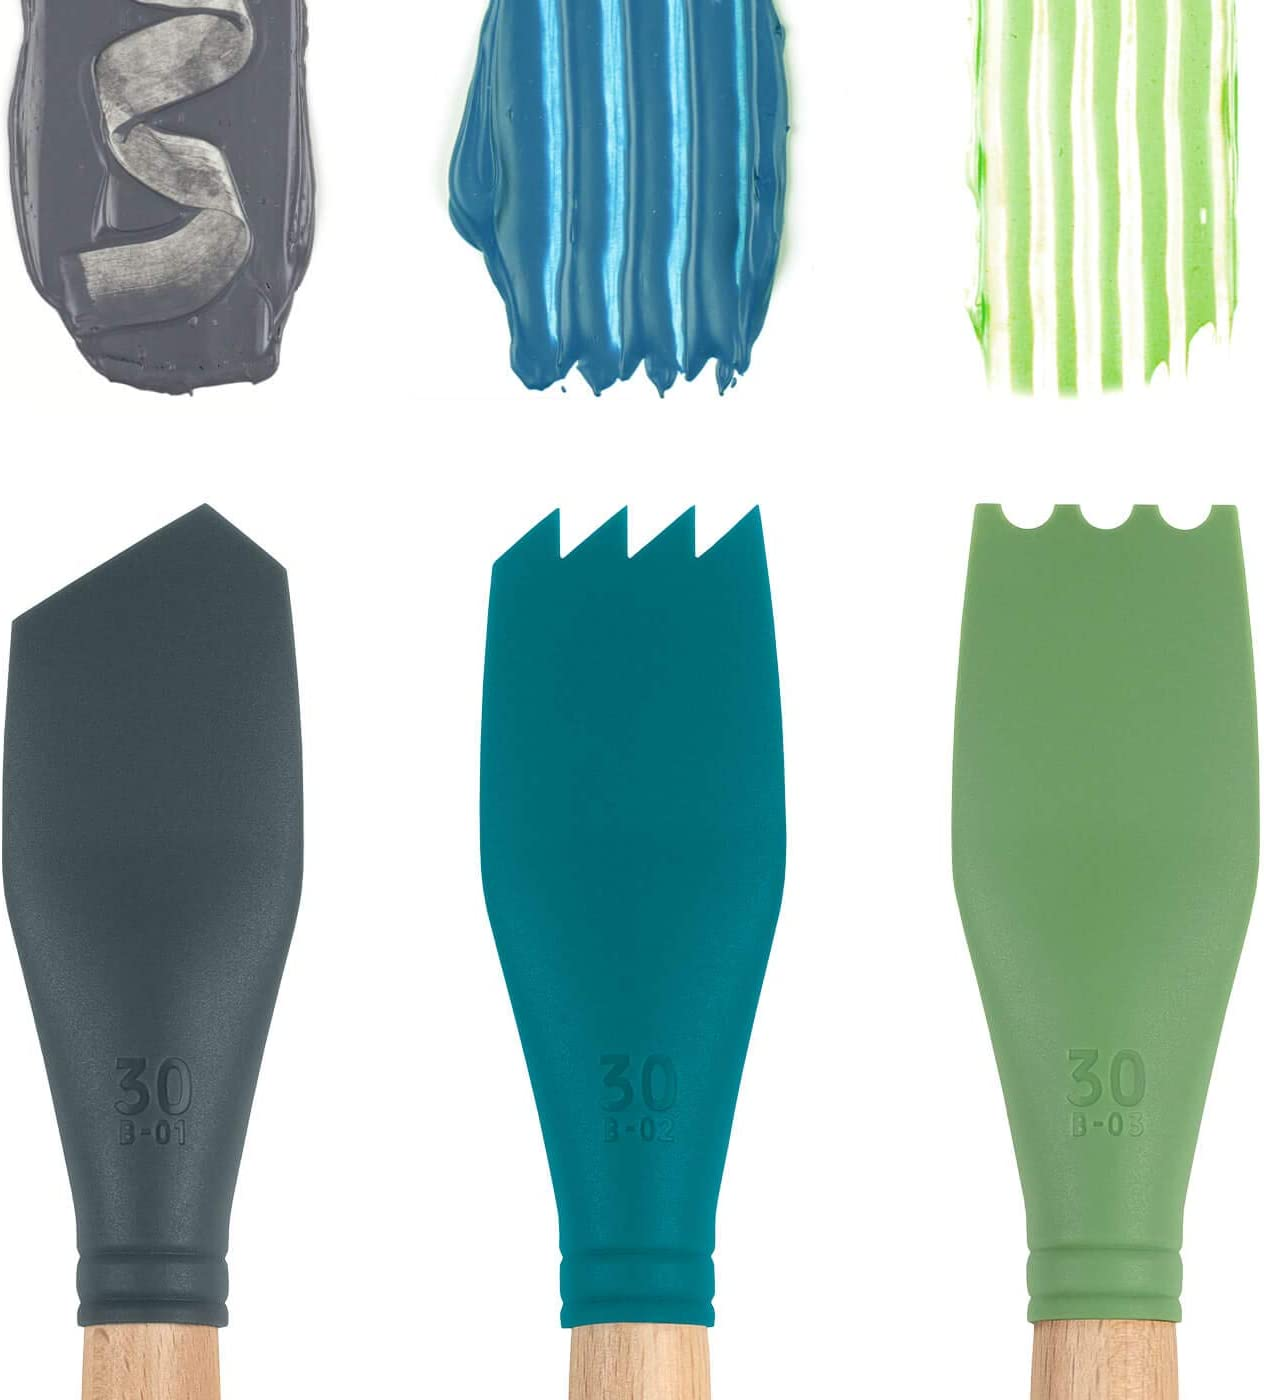 Catalyst Silicone Blade Tool-Grey B15-01